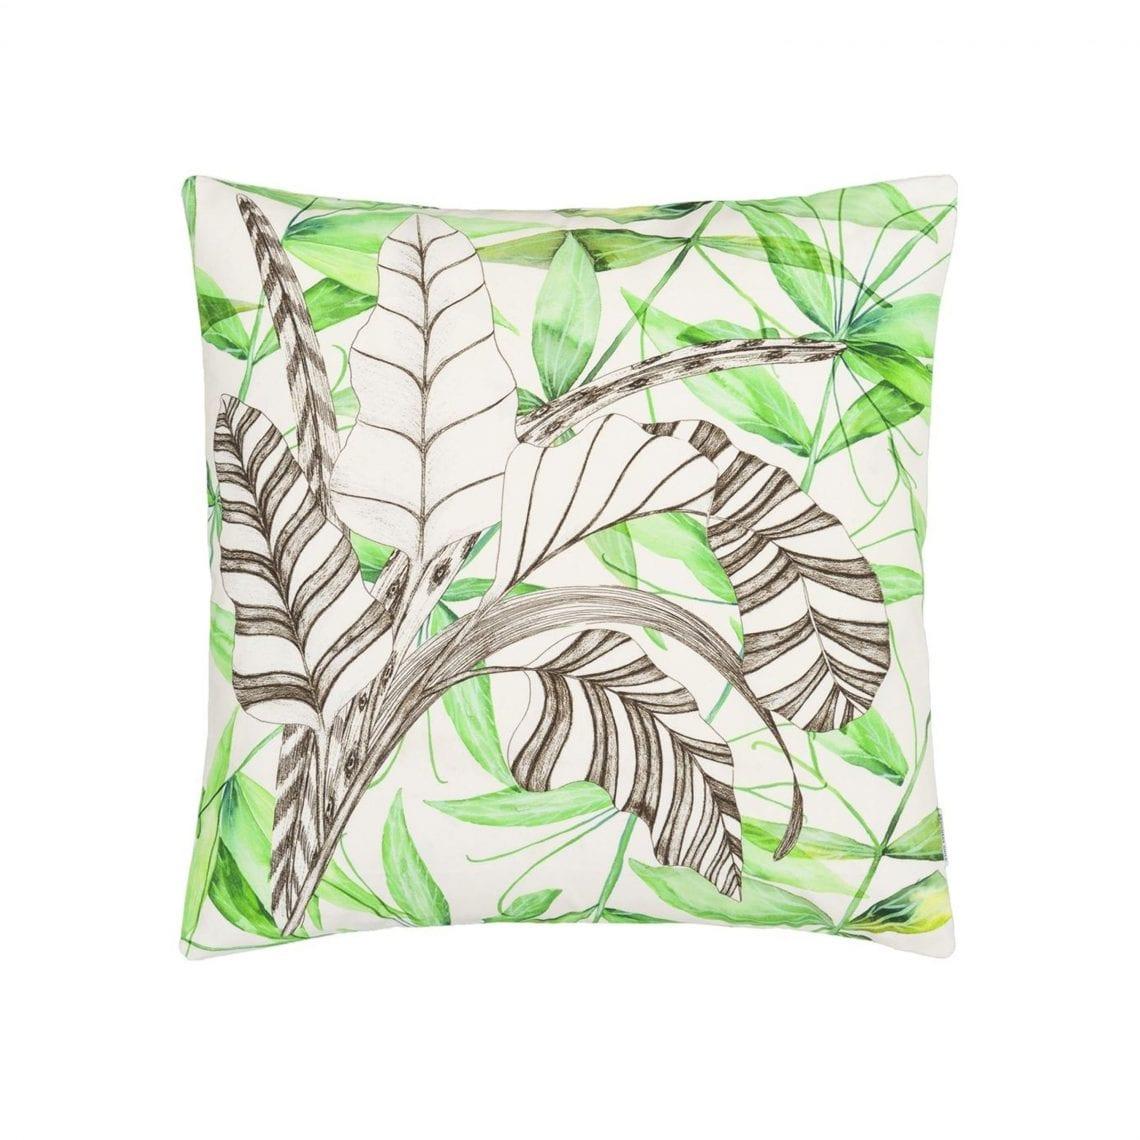 Sierkussen met botanische bladeren, Palme botanique van Designers Guild